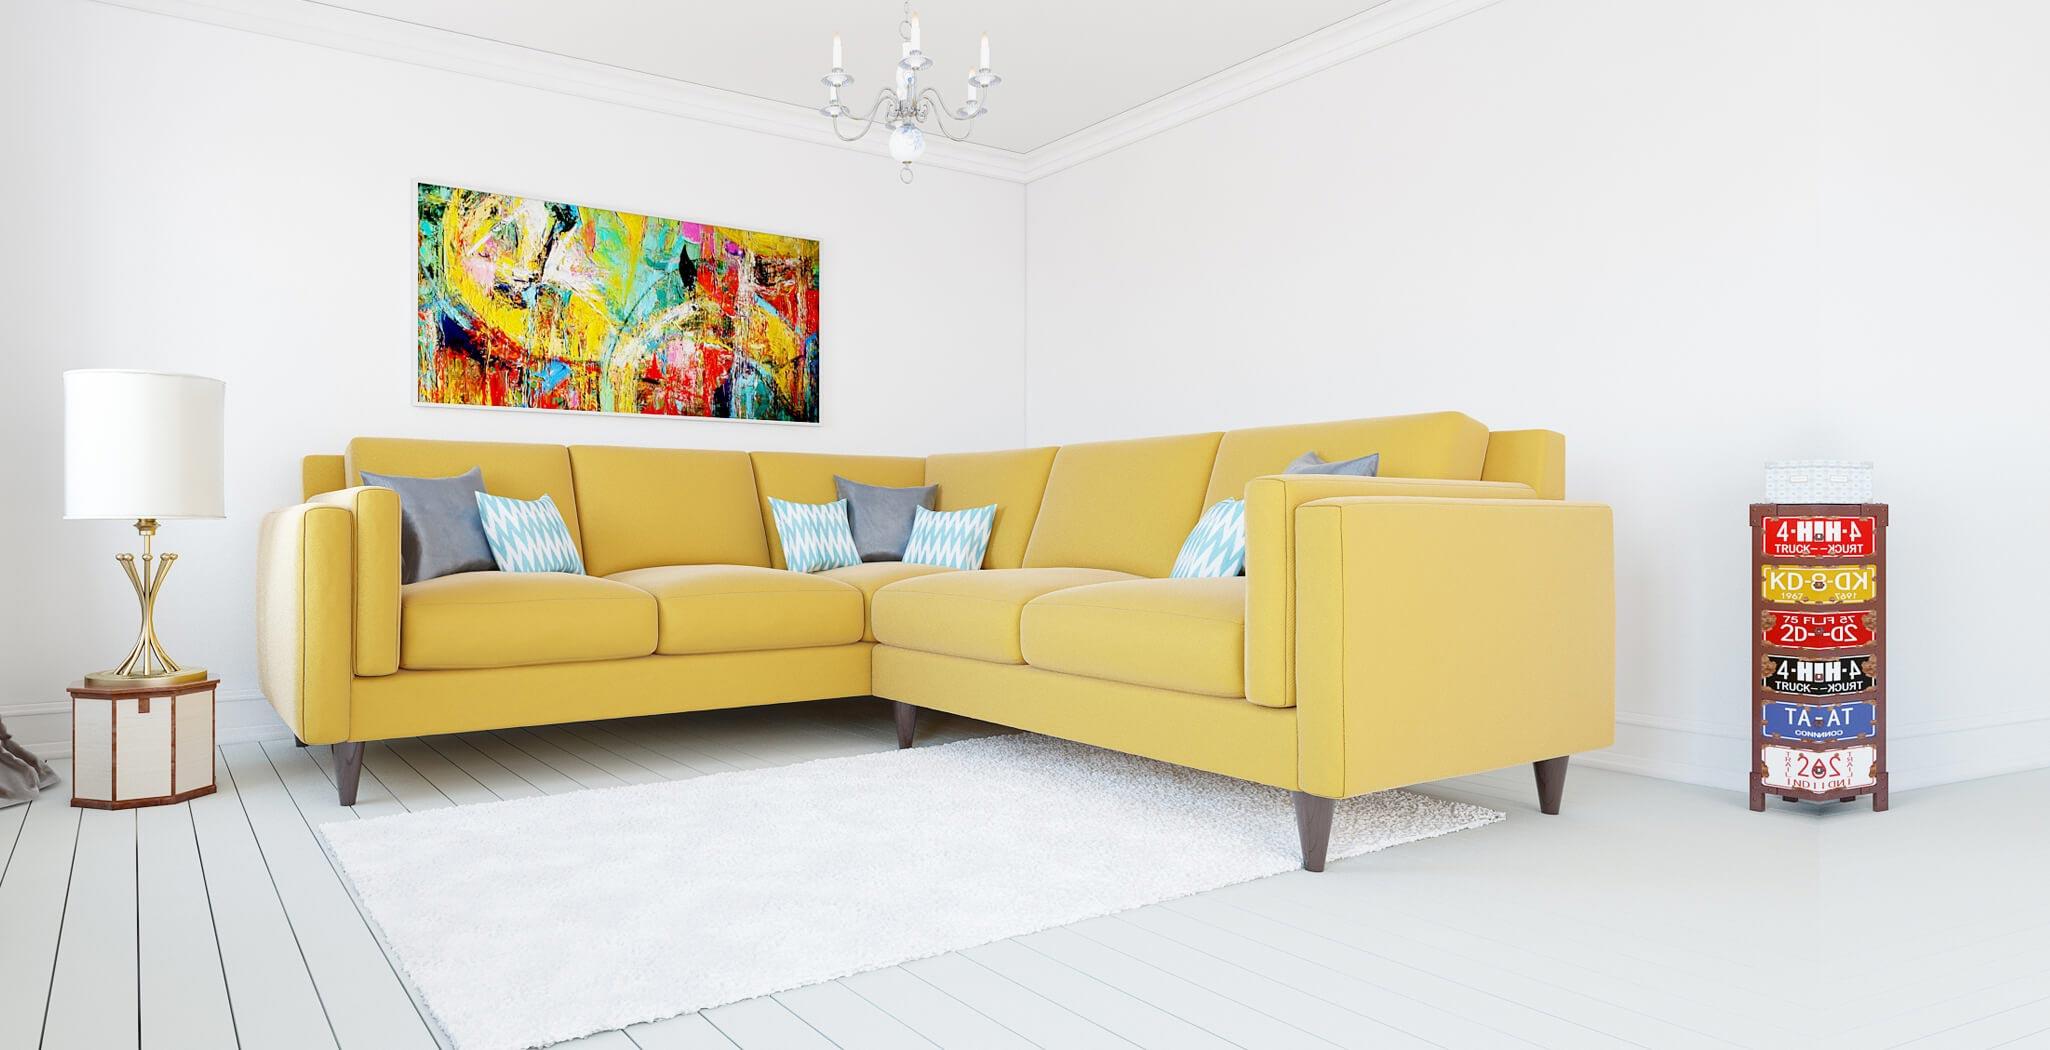 helsinki sectional furniture gallery 3